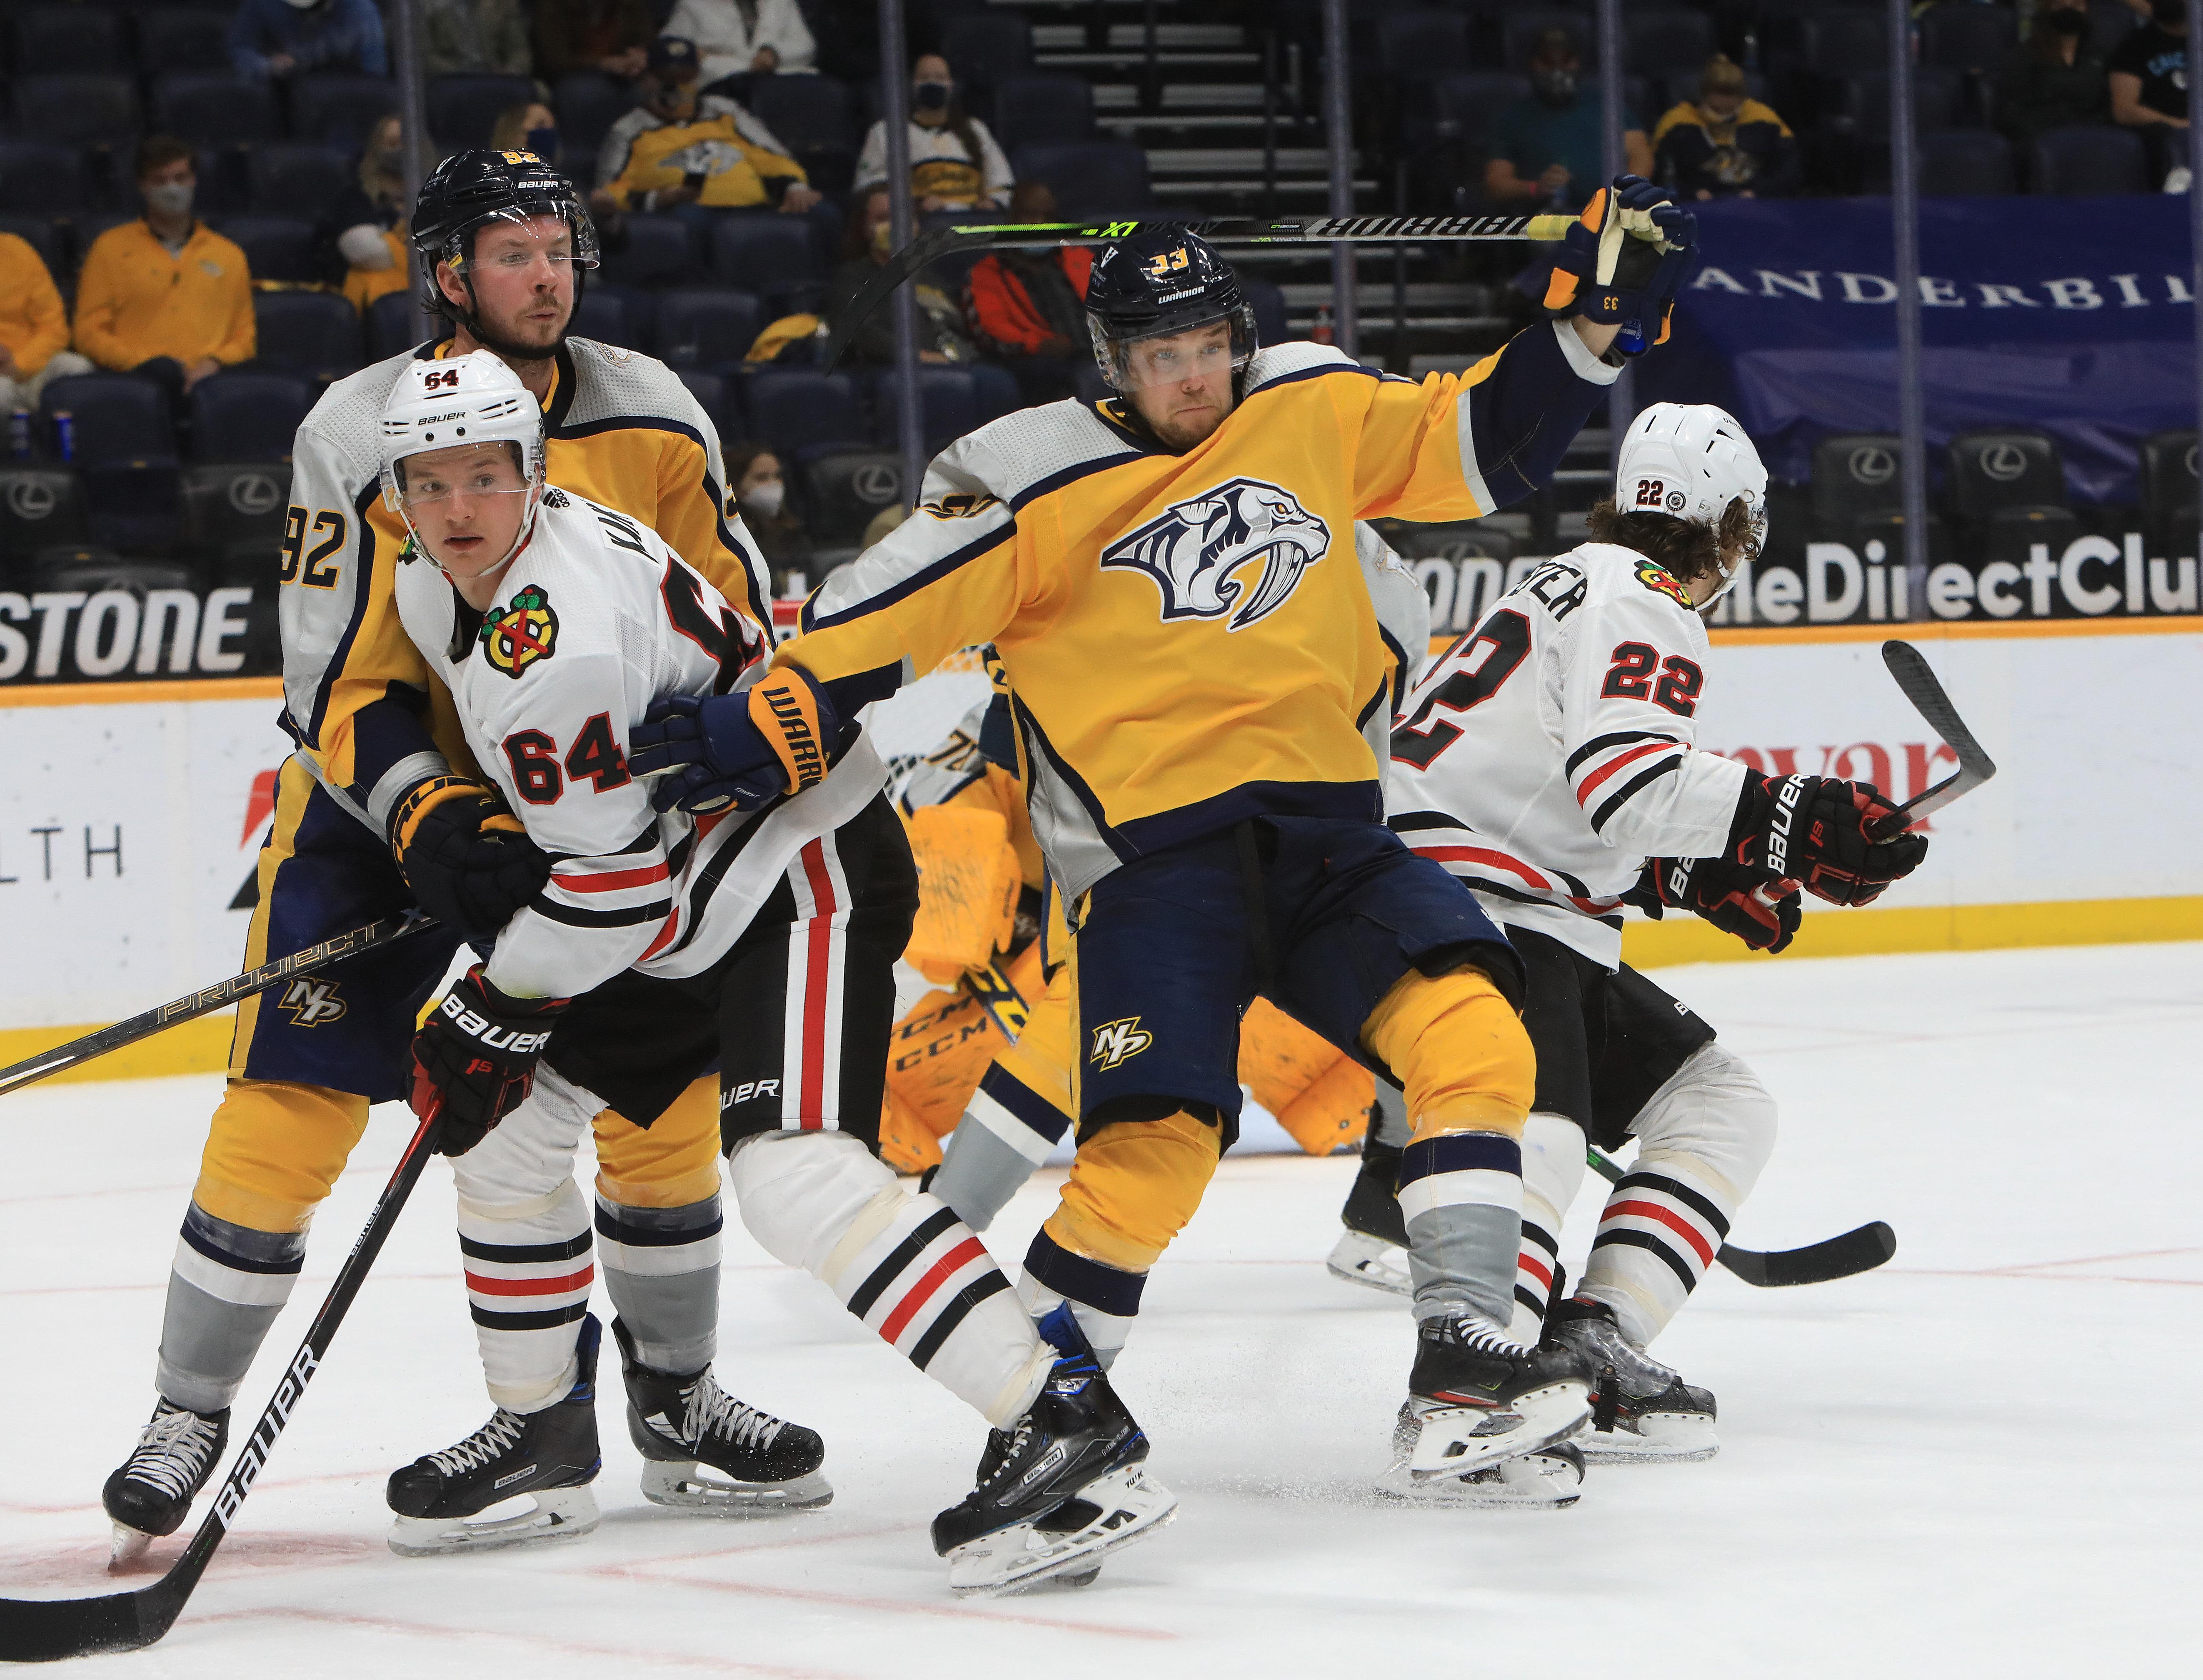 NHL: APR 19 Blackhawks at Predators